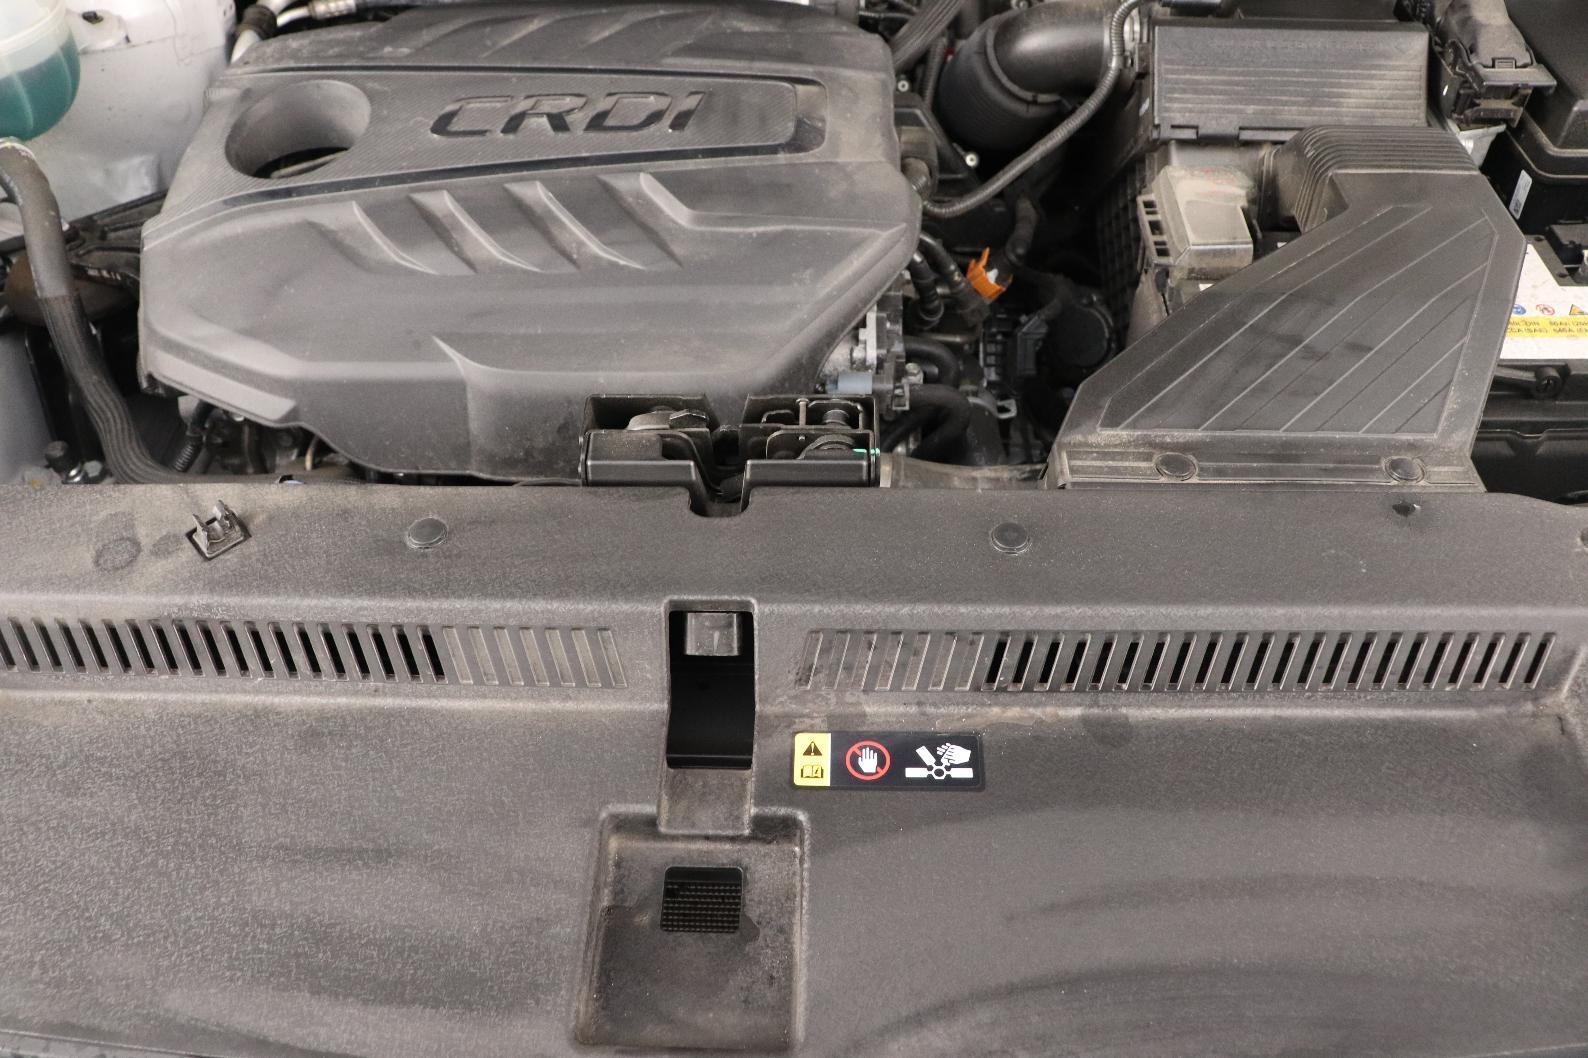 HYUNDAI TUCSON 1.6 CRDi 136 DCT-7 Business